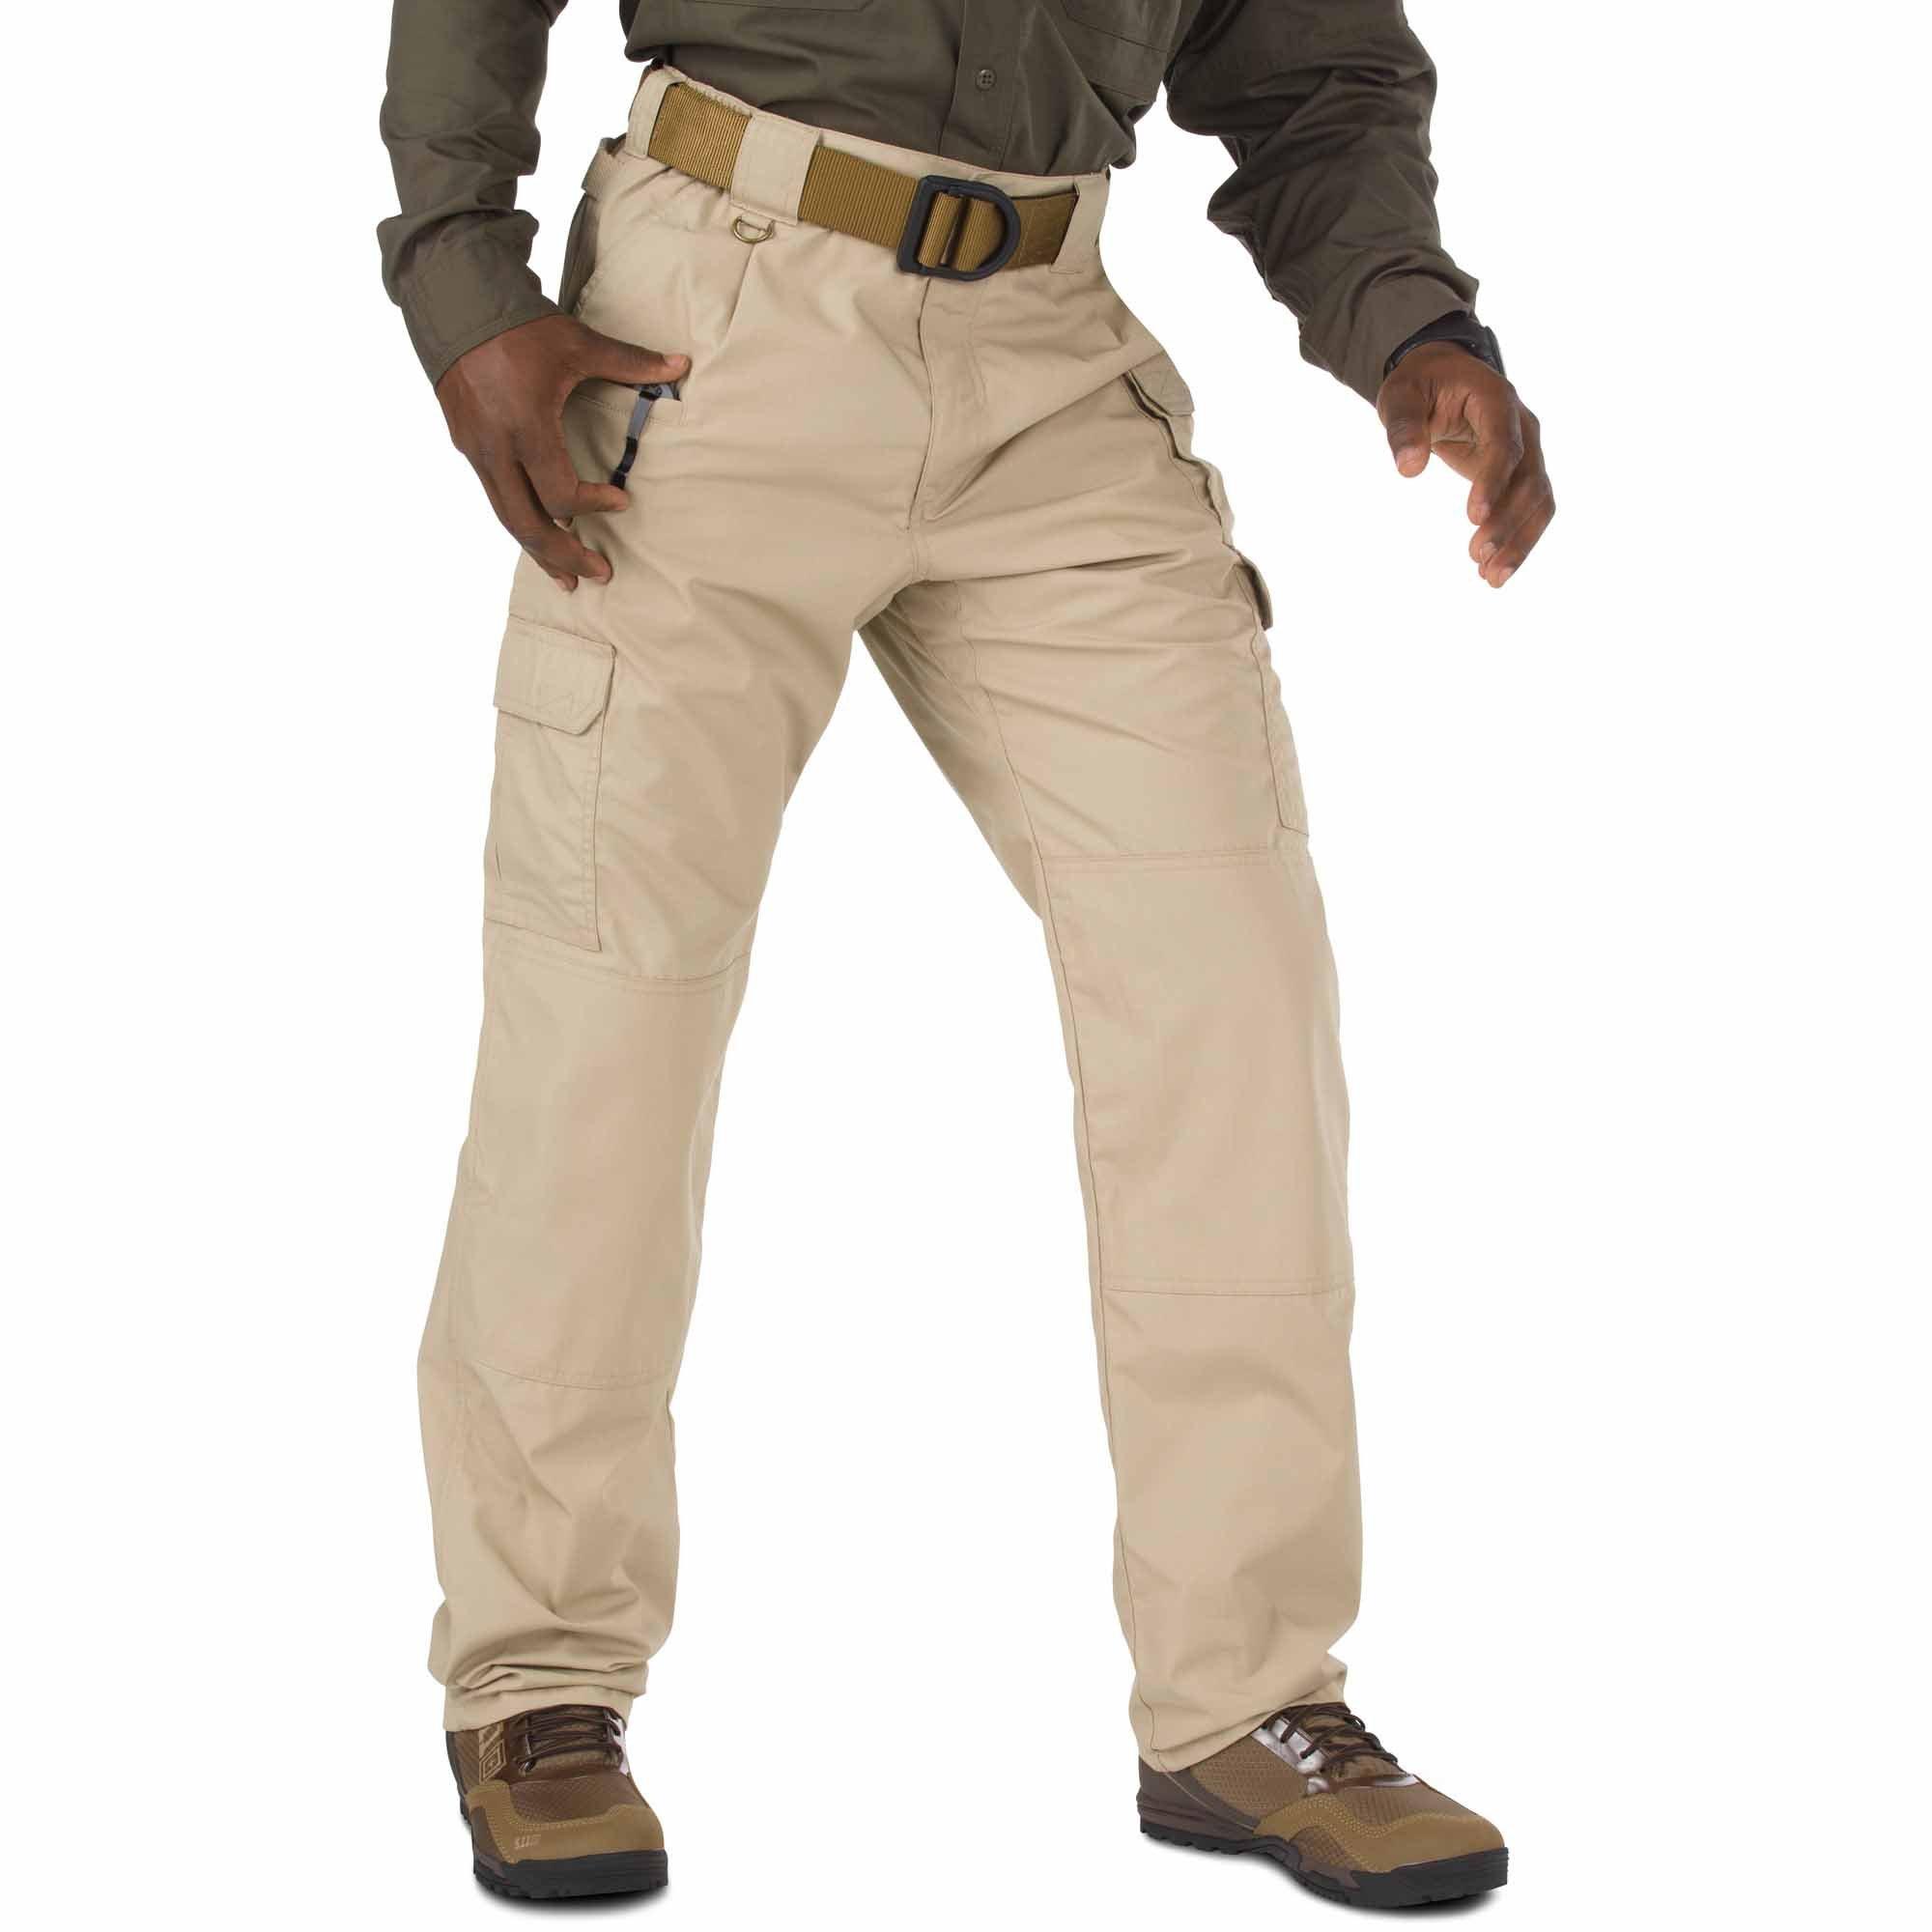 5.11 Men's TACLITE Pro Tactical Pants, Style 74273, TDU Khaki, 36Wx30L